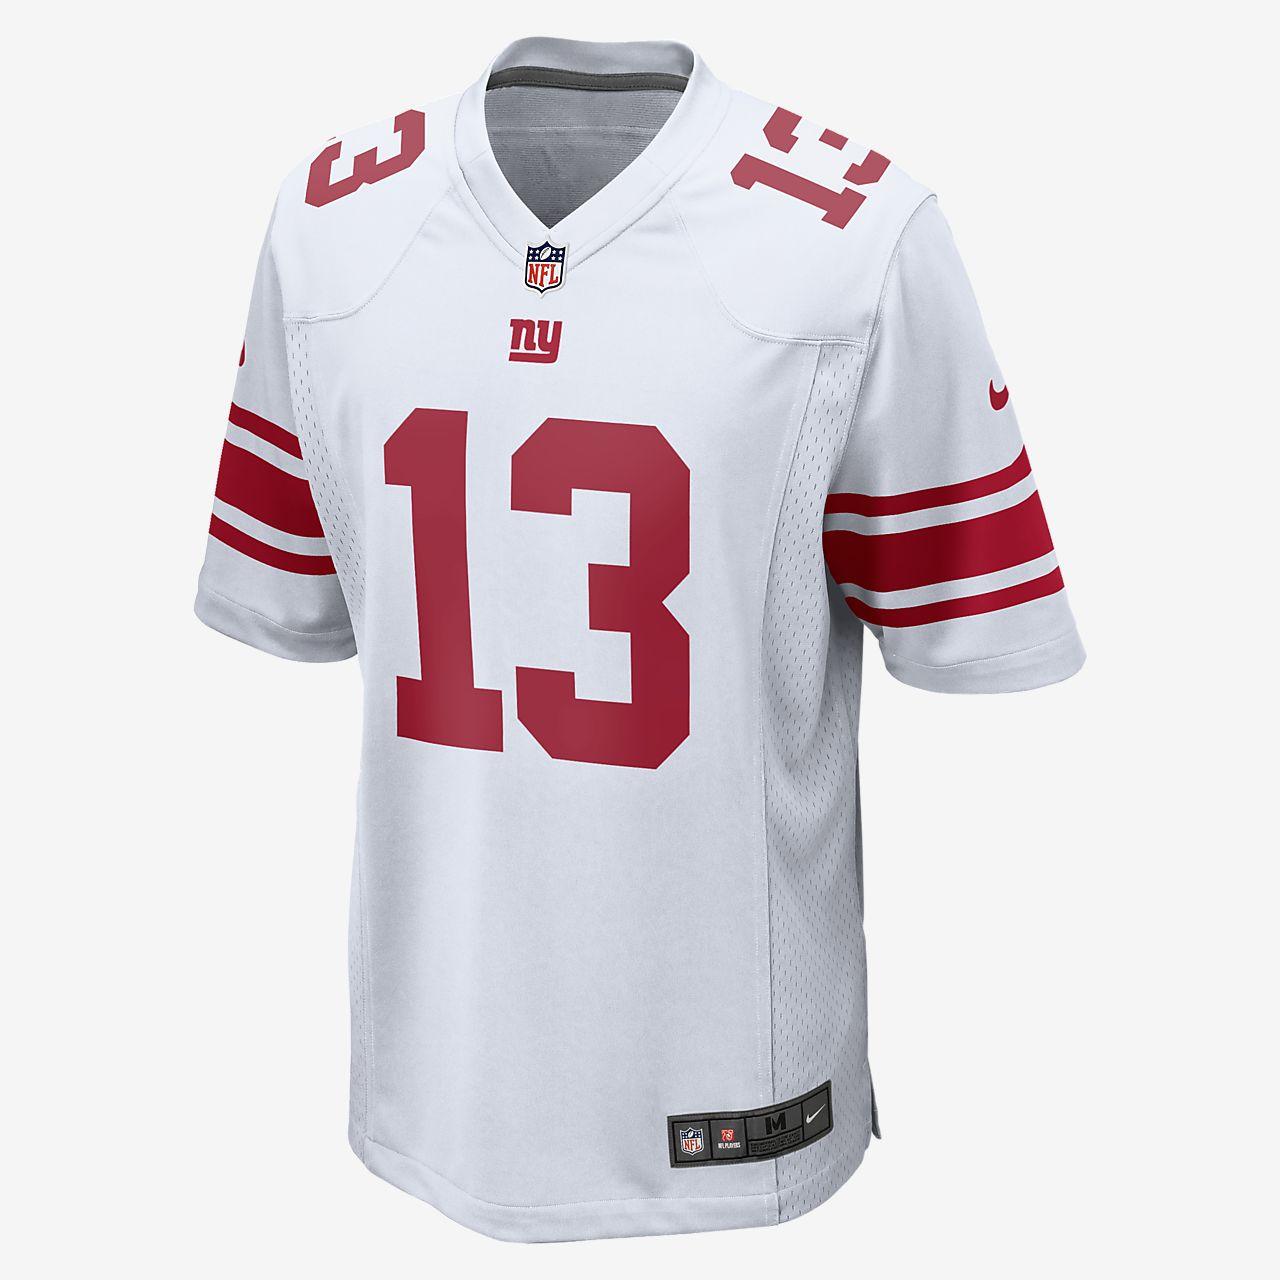 NFL New York Giants (Odell Beckham Jr.) Women's Game American Football Jersey